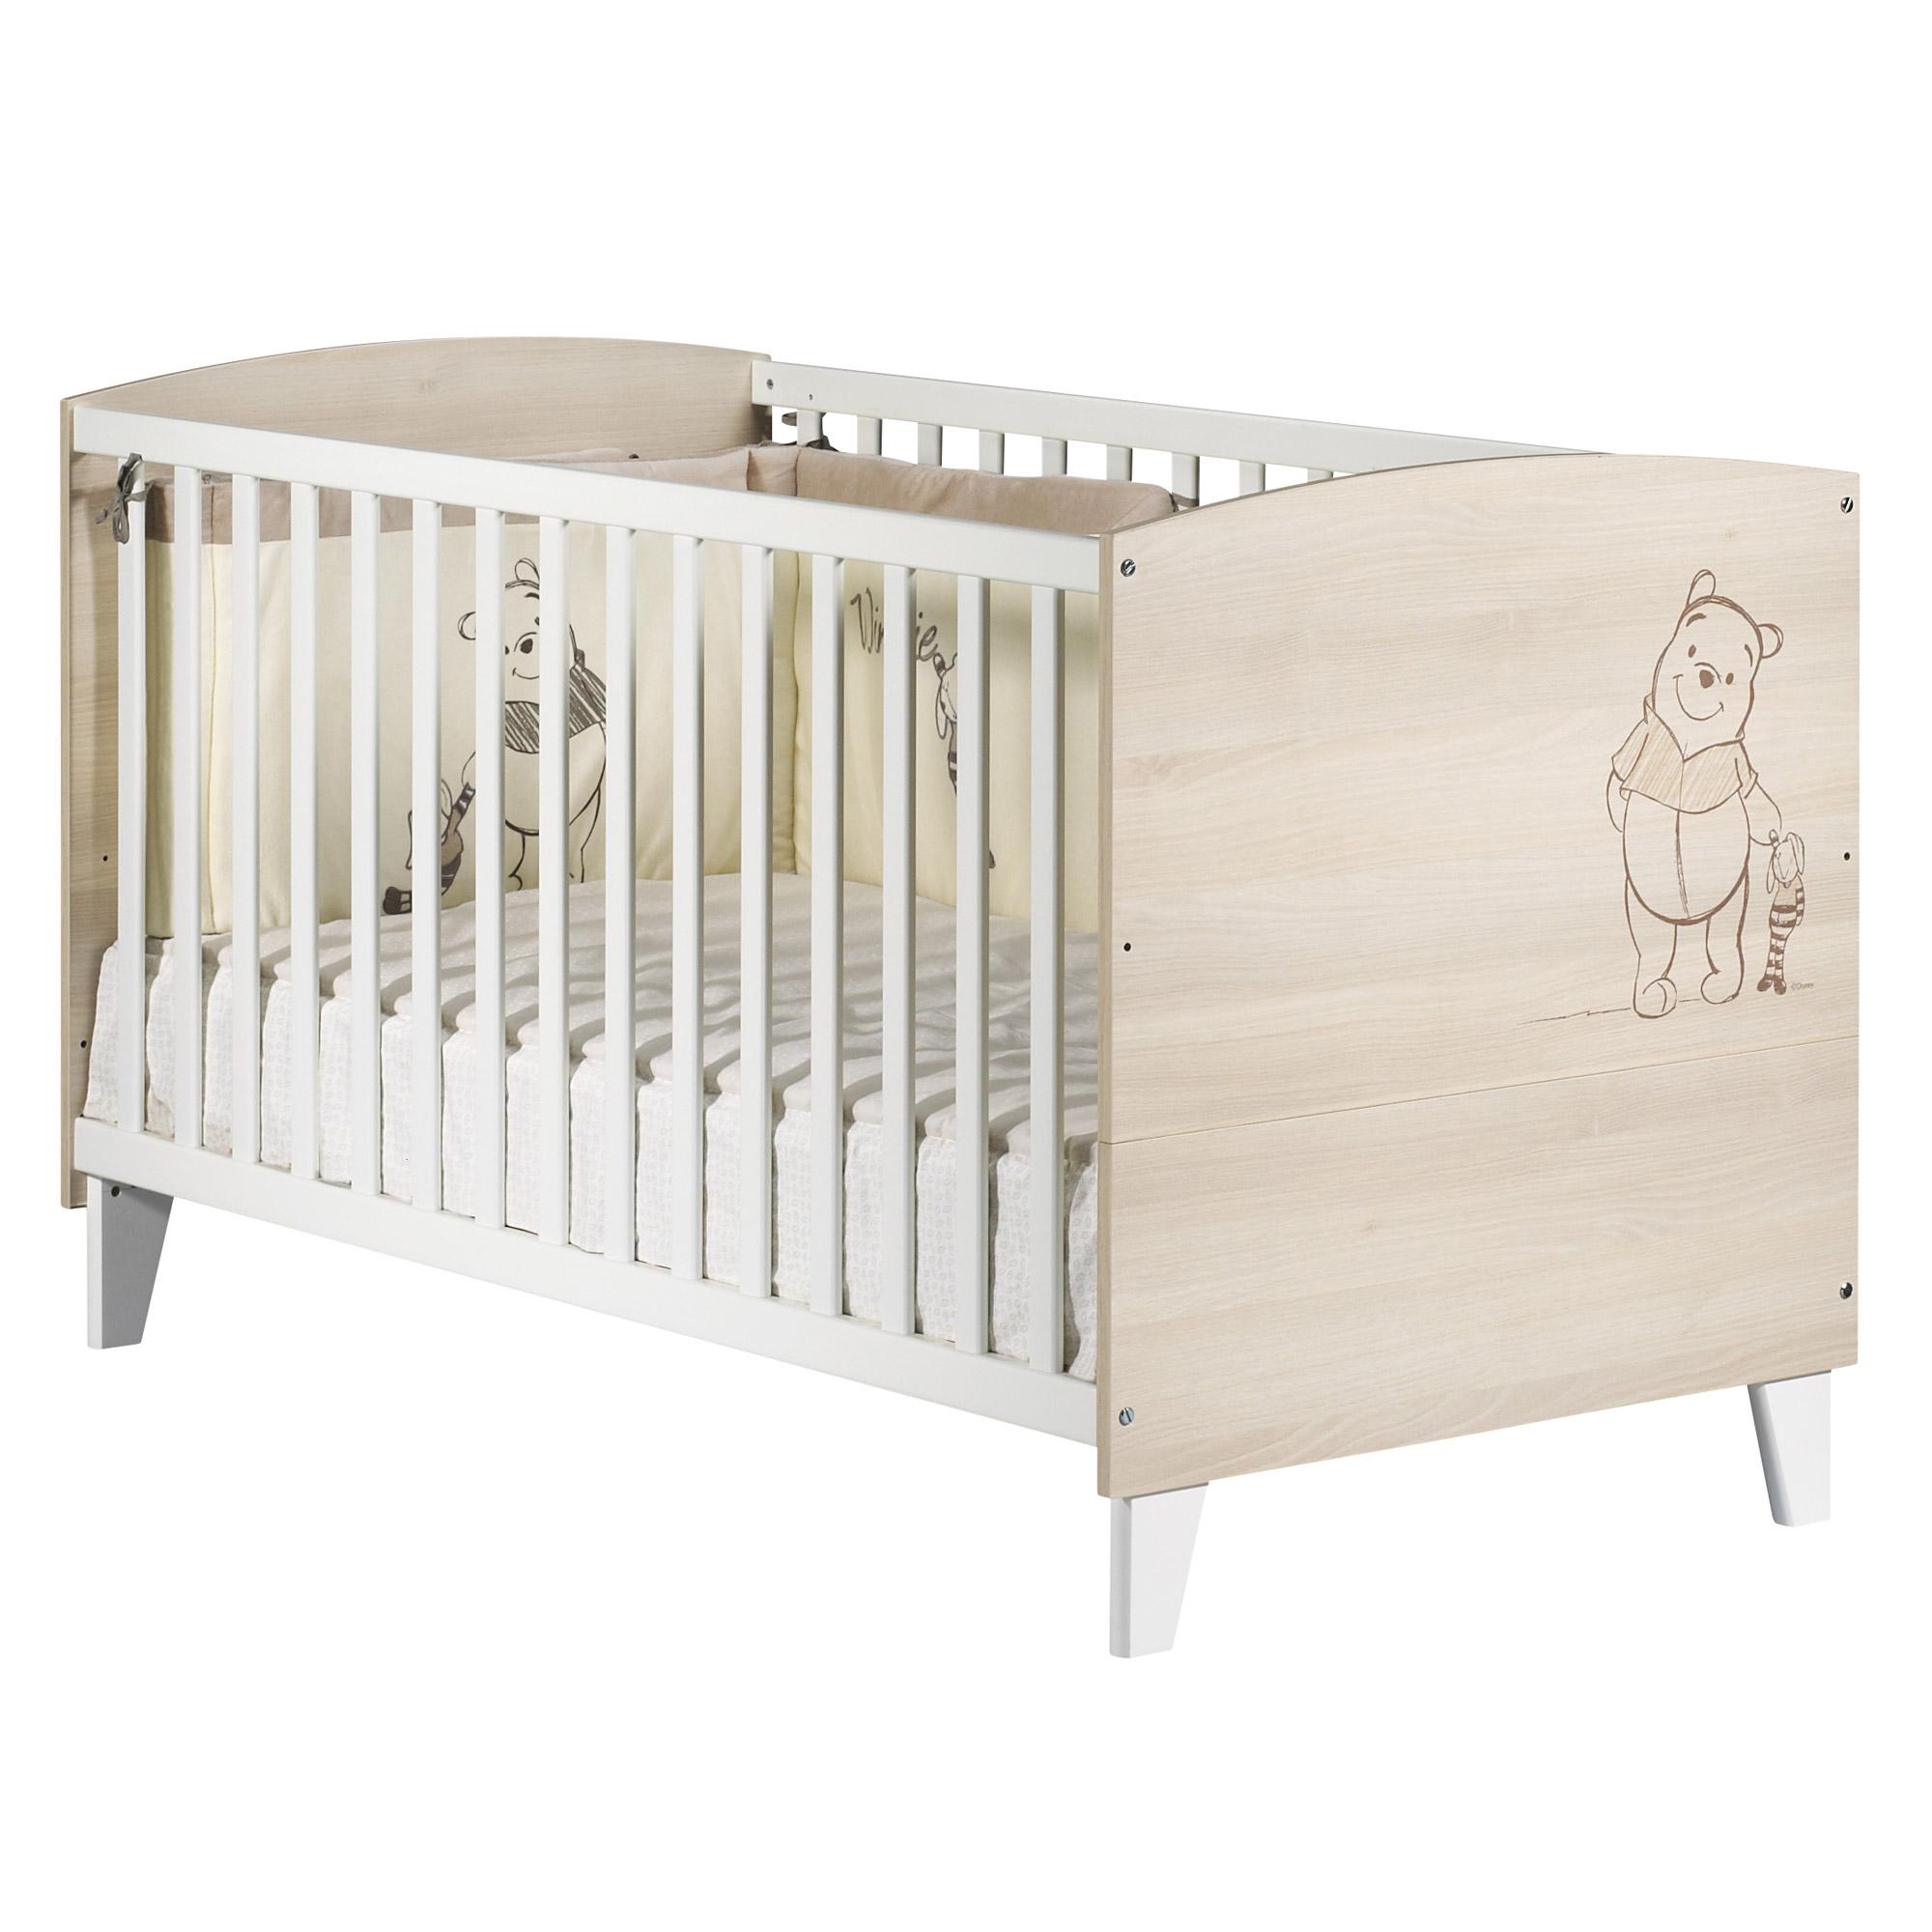 Winnie l\'Ourson little big bed 70x140 Beige70x140